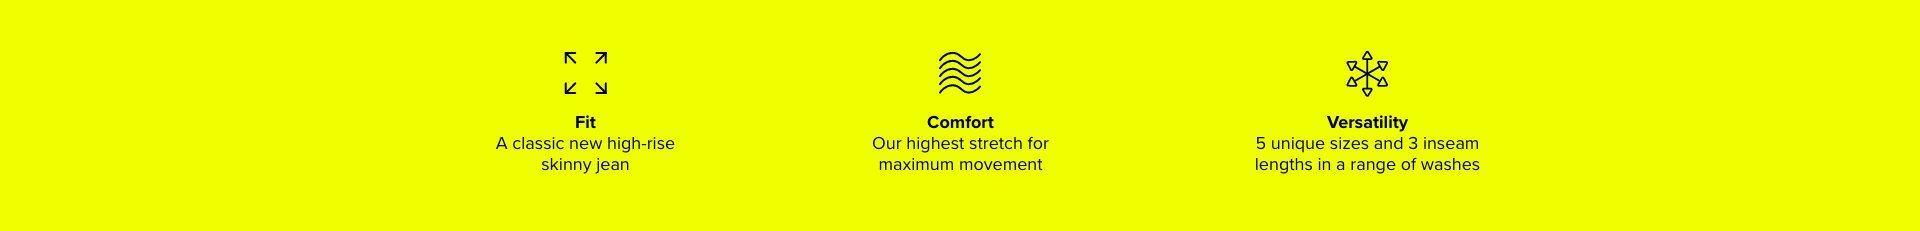 Fit, Comfort, Versatility